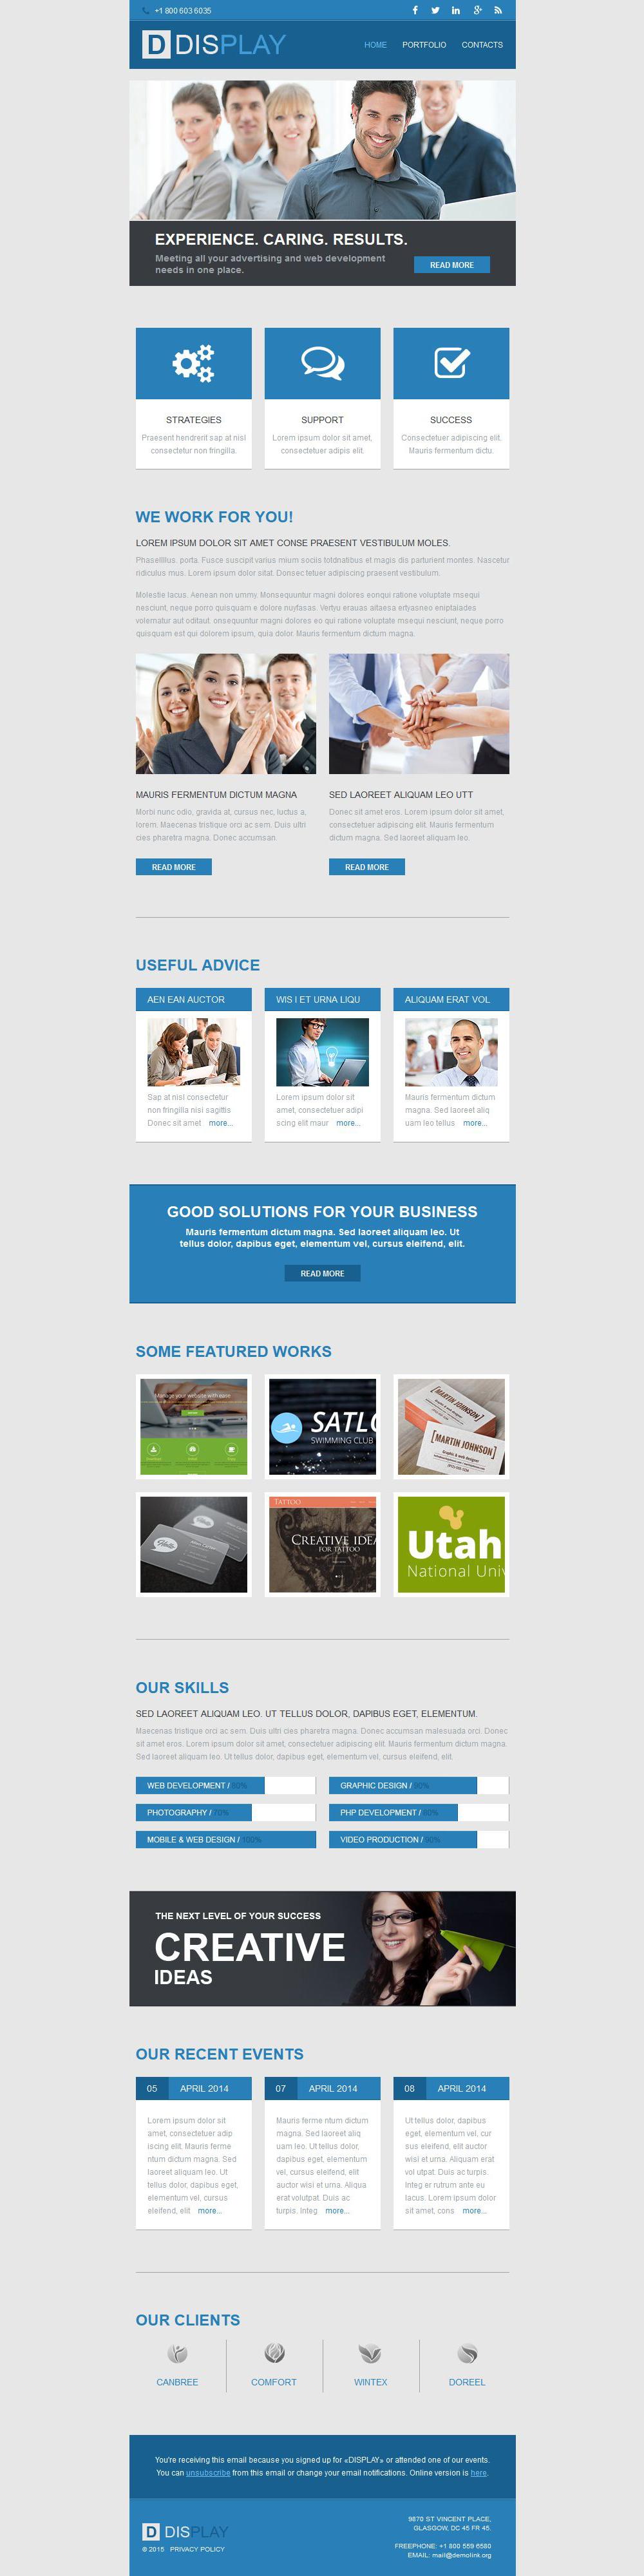 Template de Newsletter Flexível para Sites de Web Design №52682